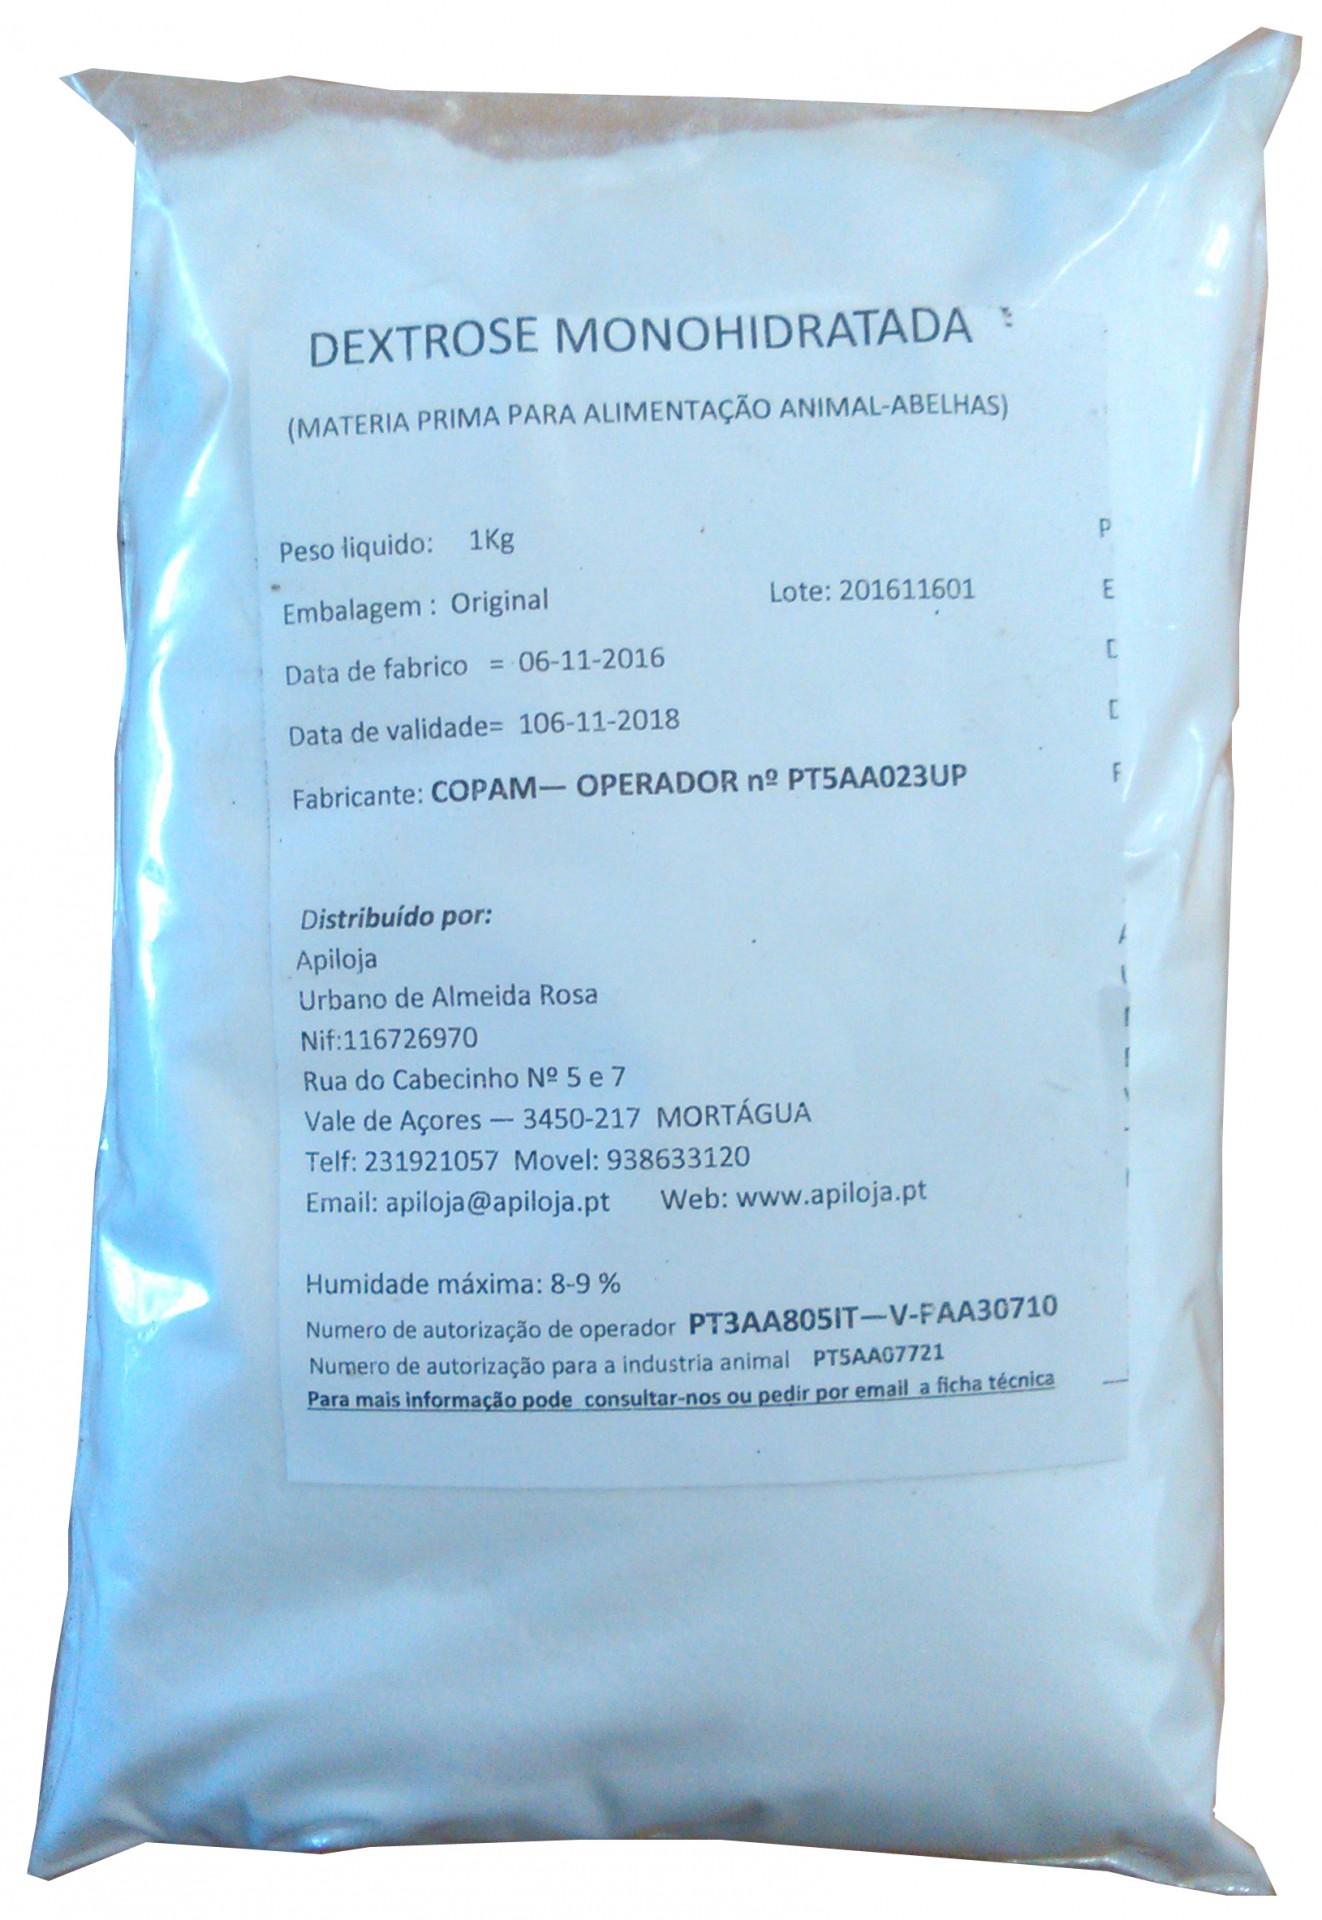 Dextrose Monohidratada